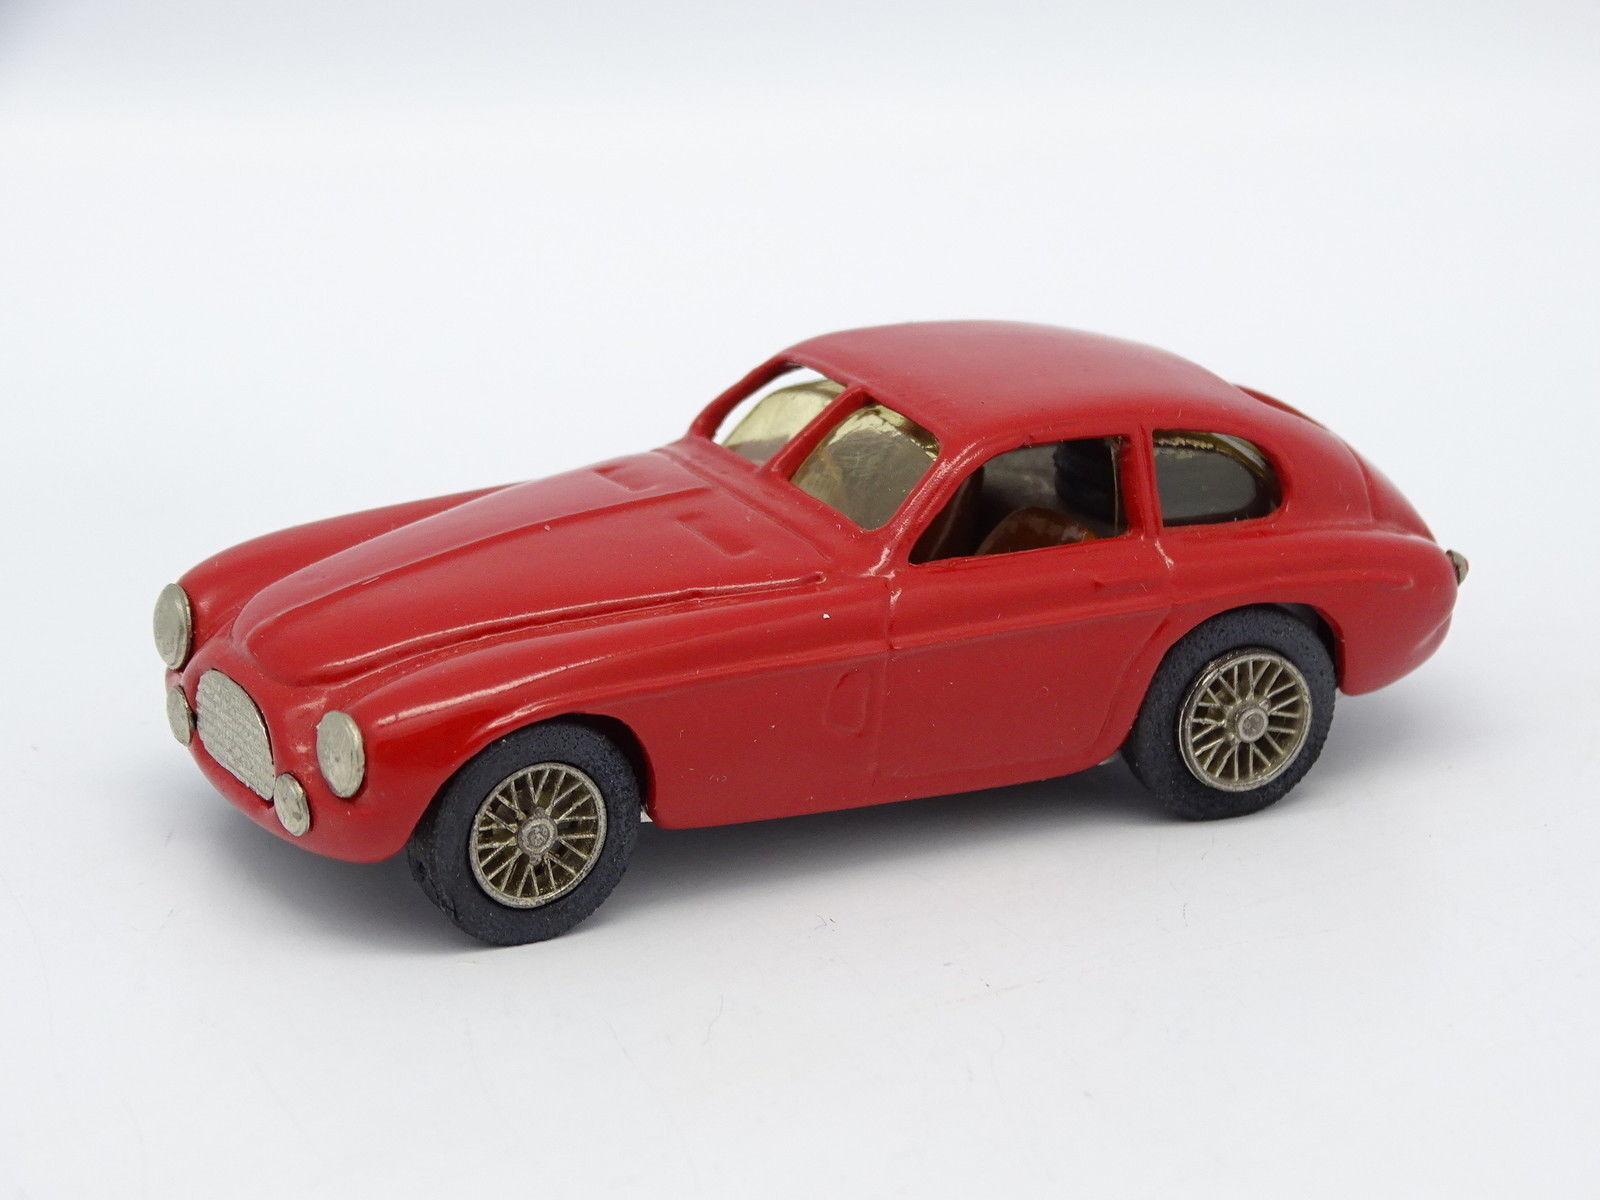 John Day Day Day Kit Assembled Metal 1 43 - Ferrari 166 Inter Touring eb656e